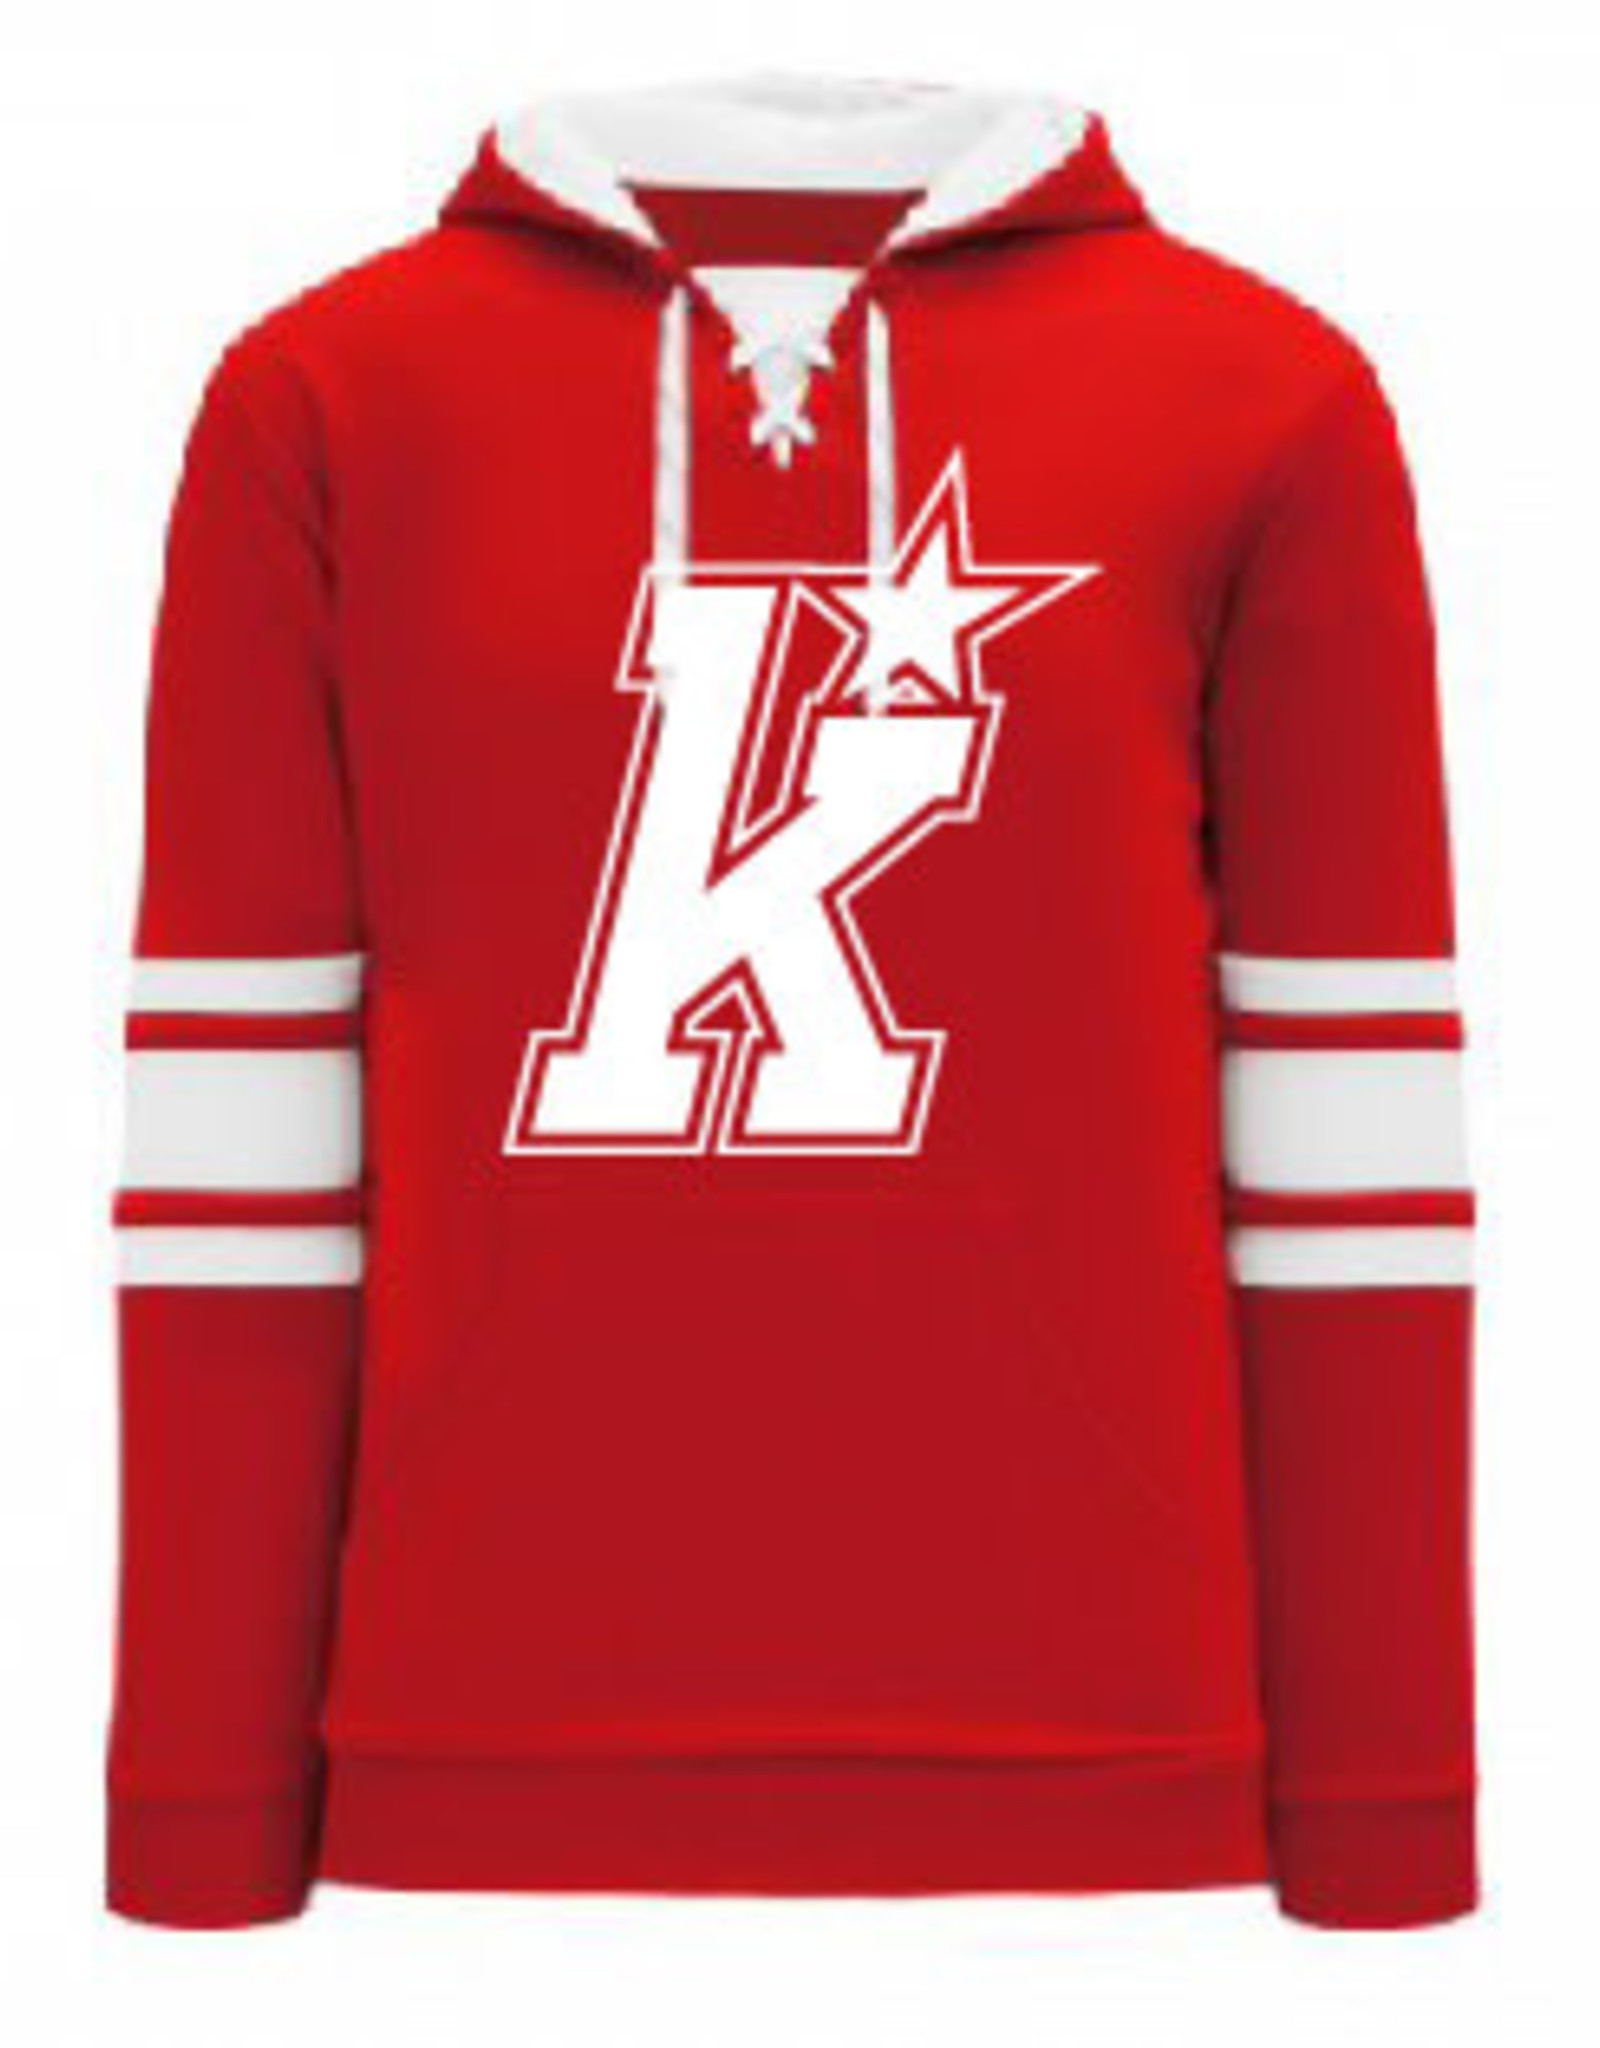 AK Kirkwood Jersey Lace Up Hoody (ADULT)